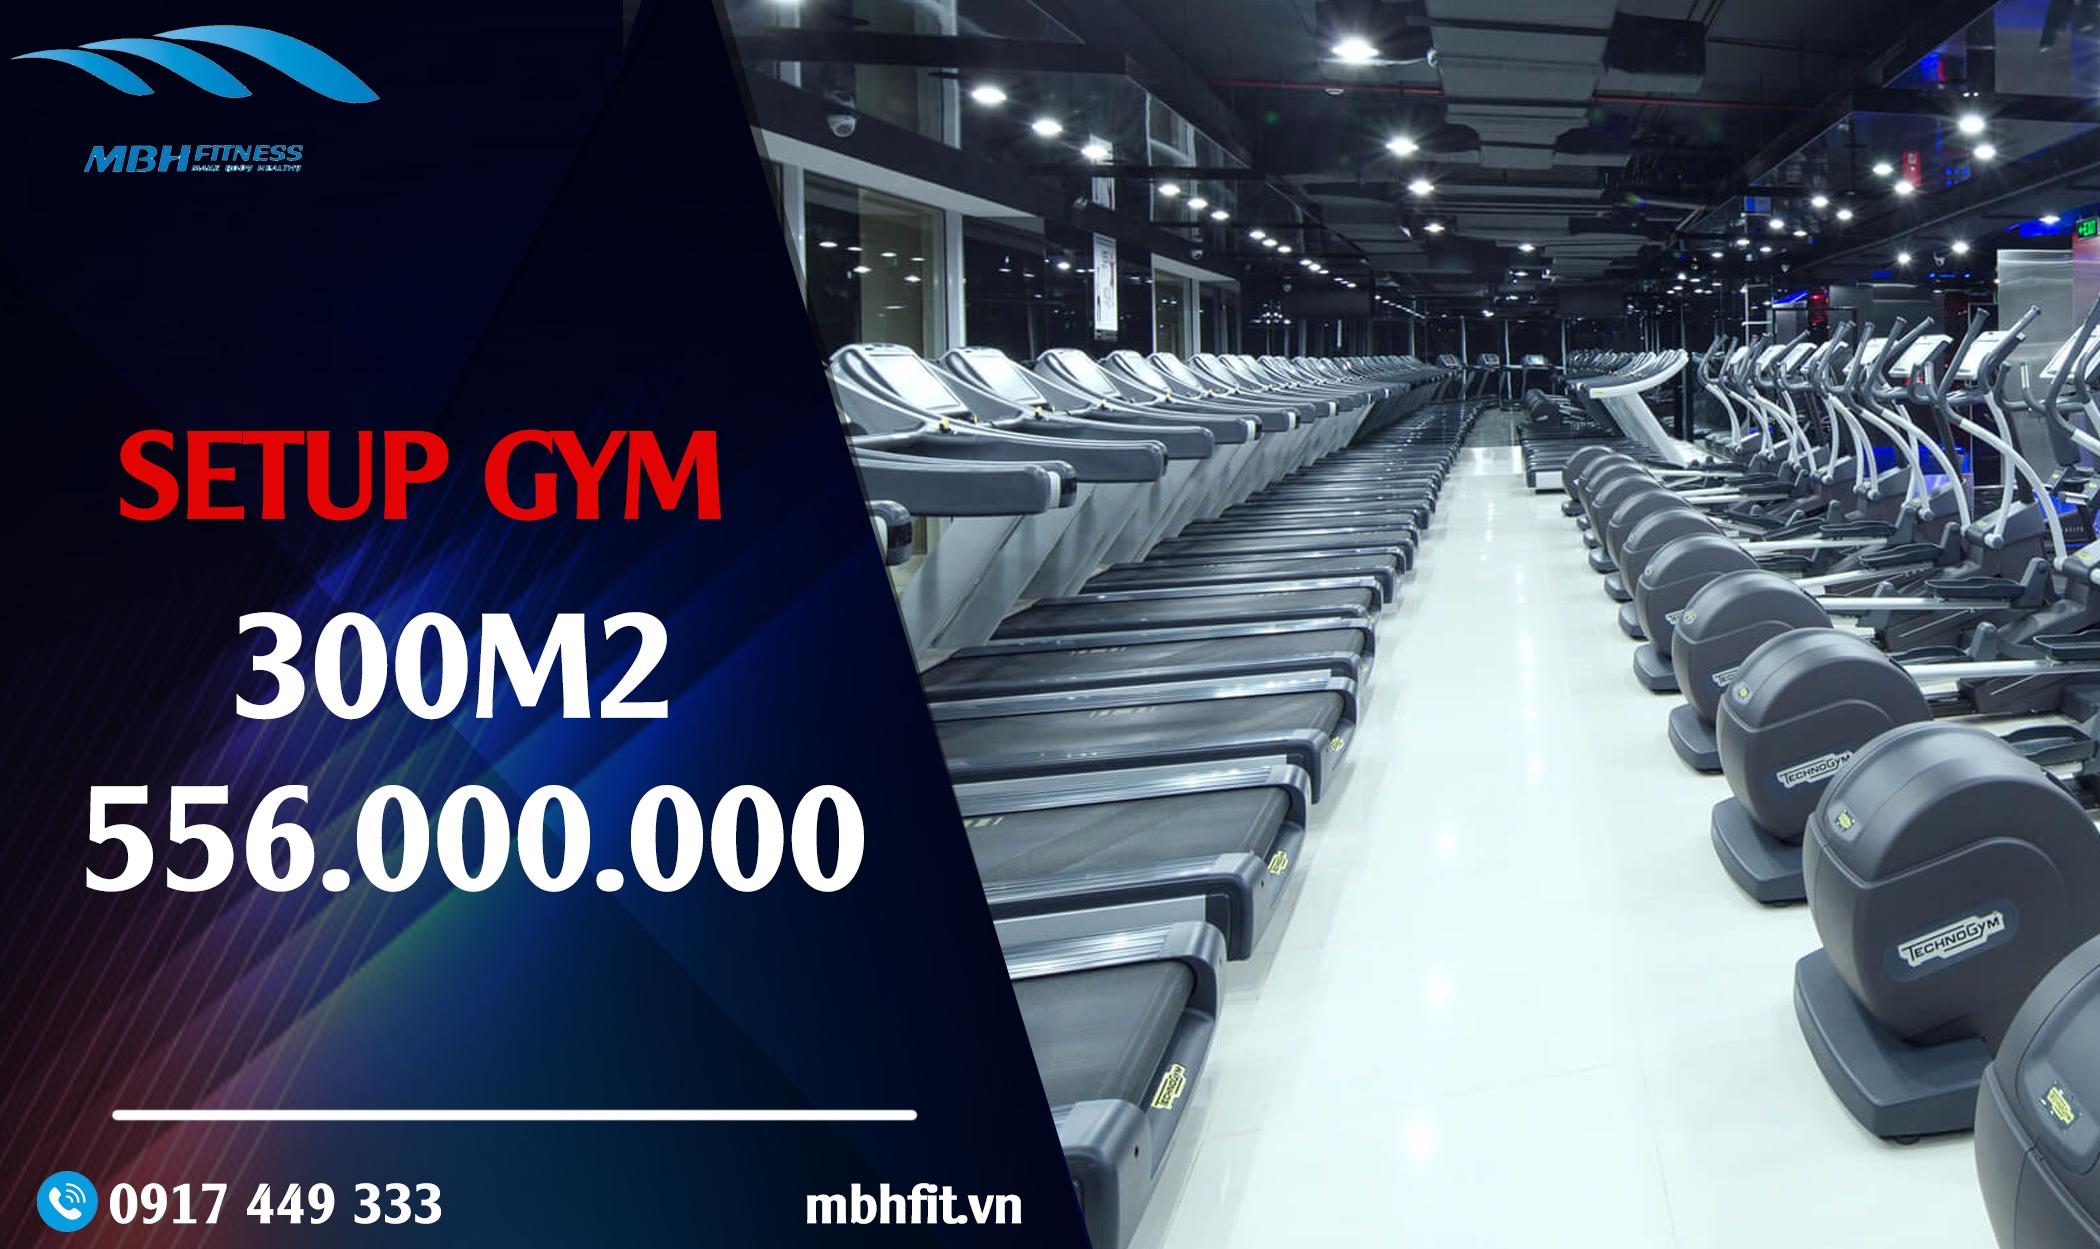 Setup phòng Gym 300m2, 556 triệu